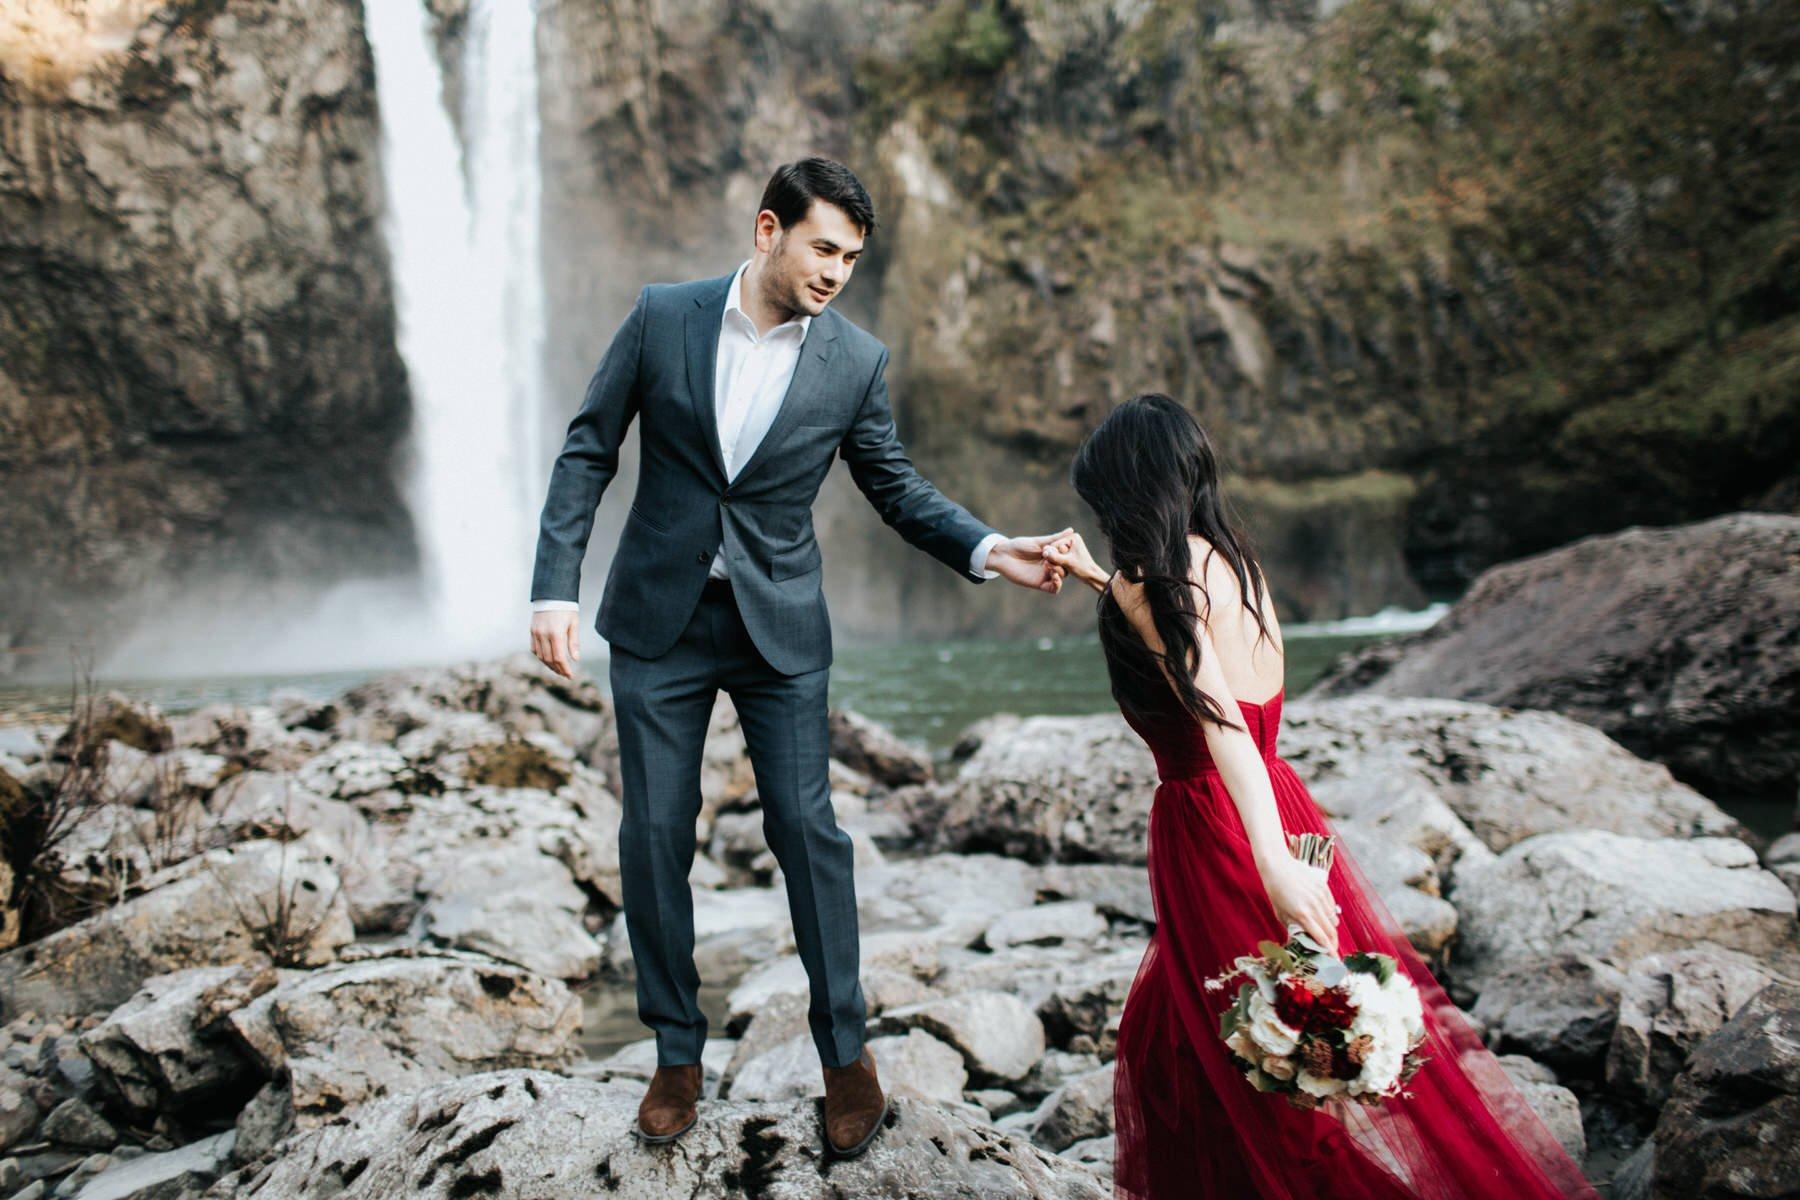 A groom helps his bride at snoqualmie falls